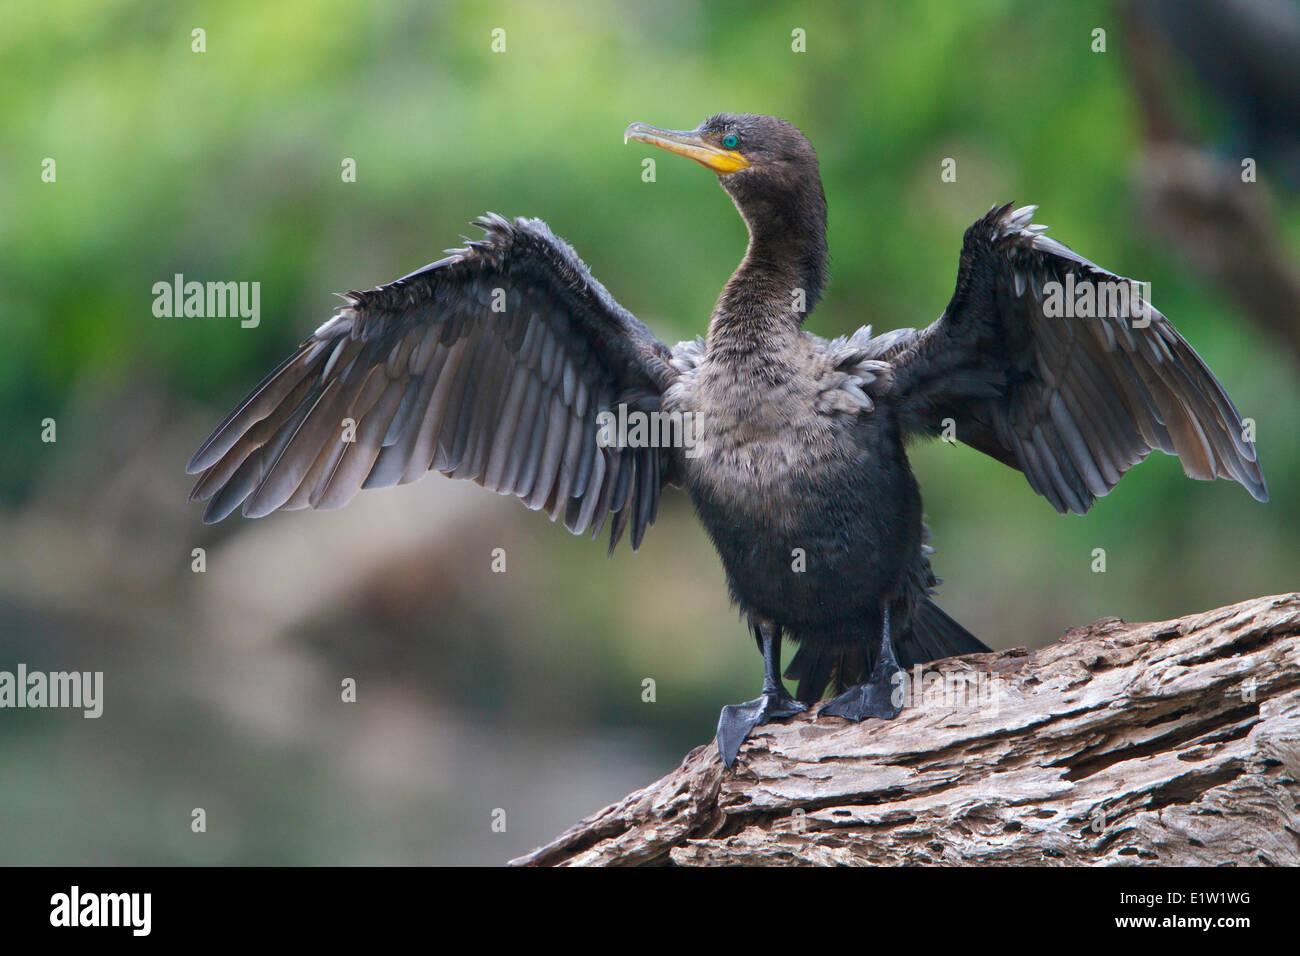 Neotropic Cormorant (Phalacrocorax brasilianus) perched on a branch in Peru. - Stock Image